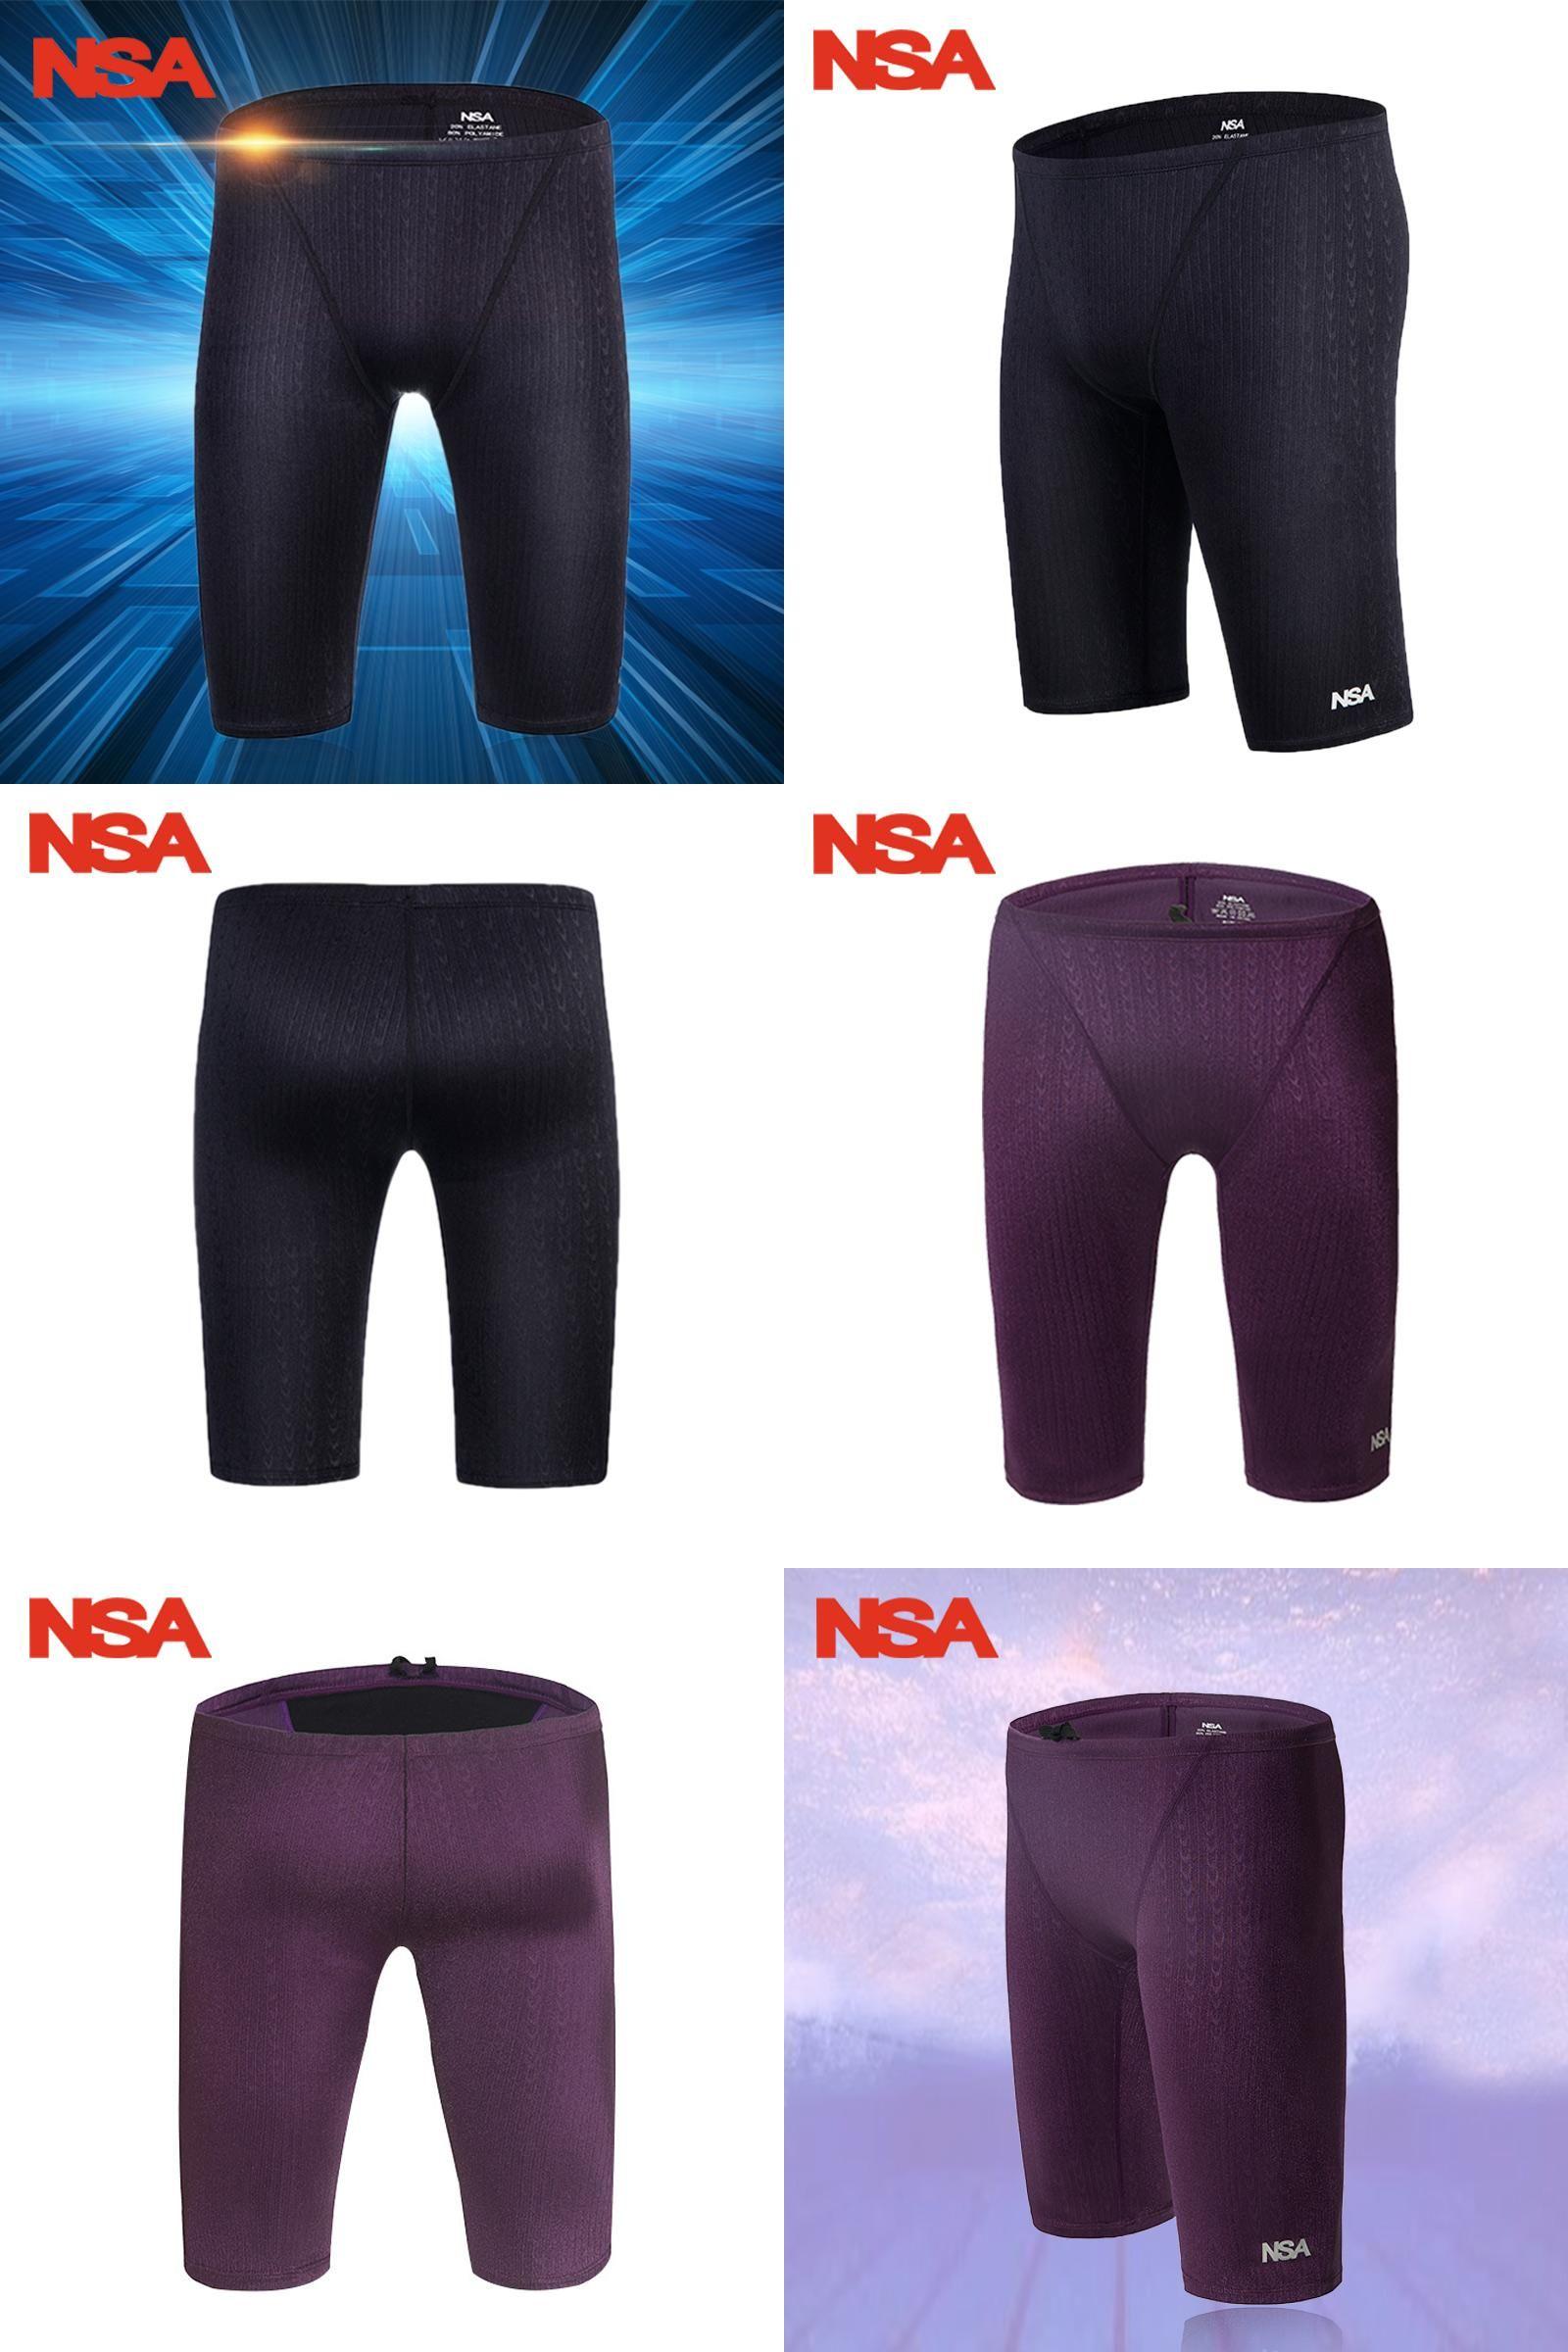 65d38cdb26dfc  Visit to Buy  NSA Arena Swimwear Men Swimsuit Trunk sharkskin professional  swimming jammer trunks